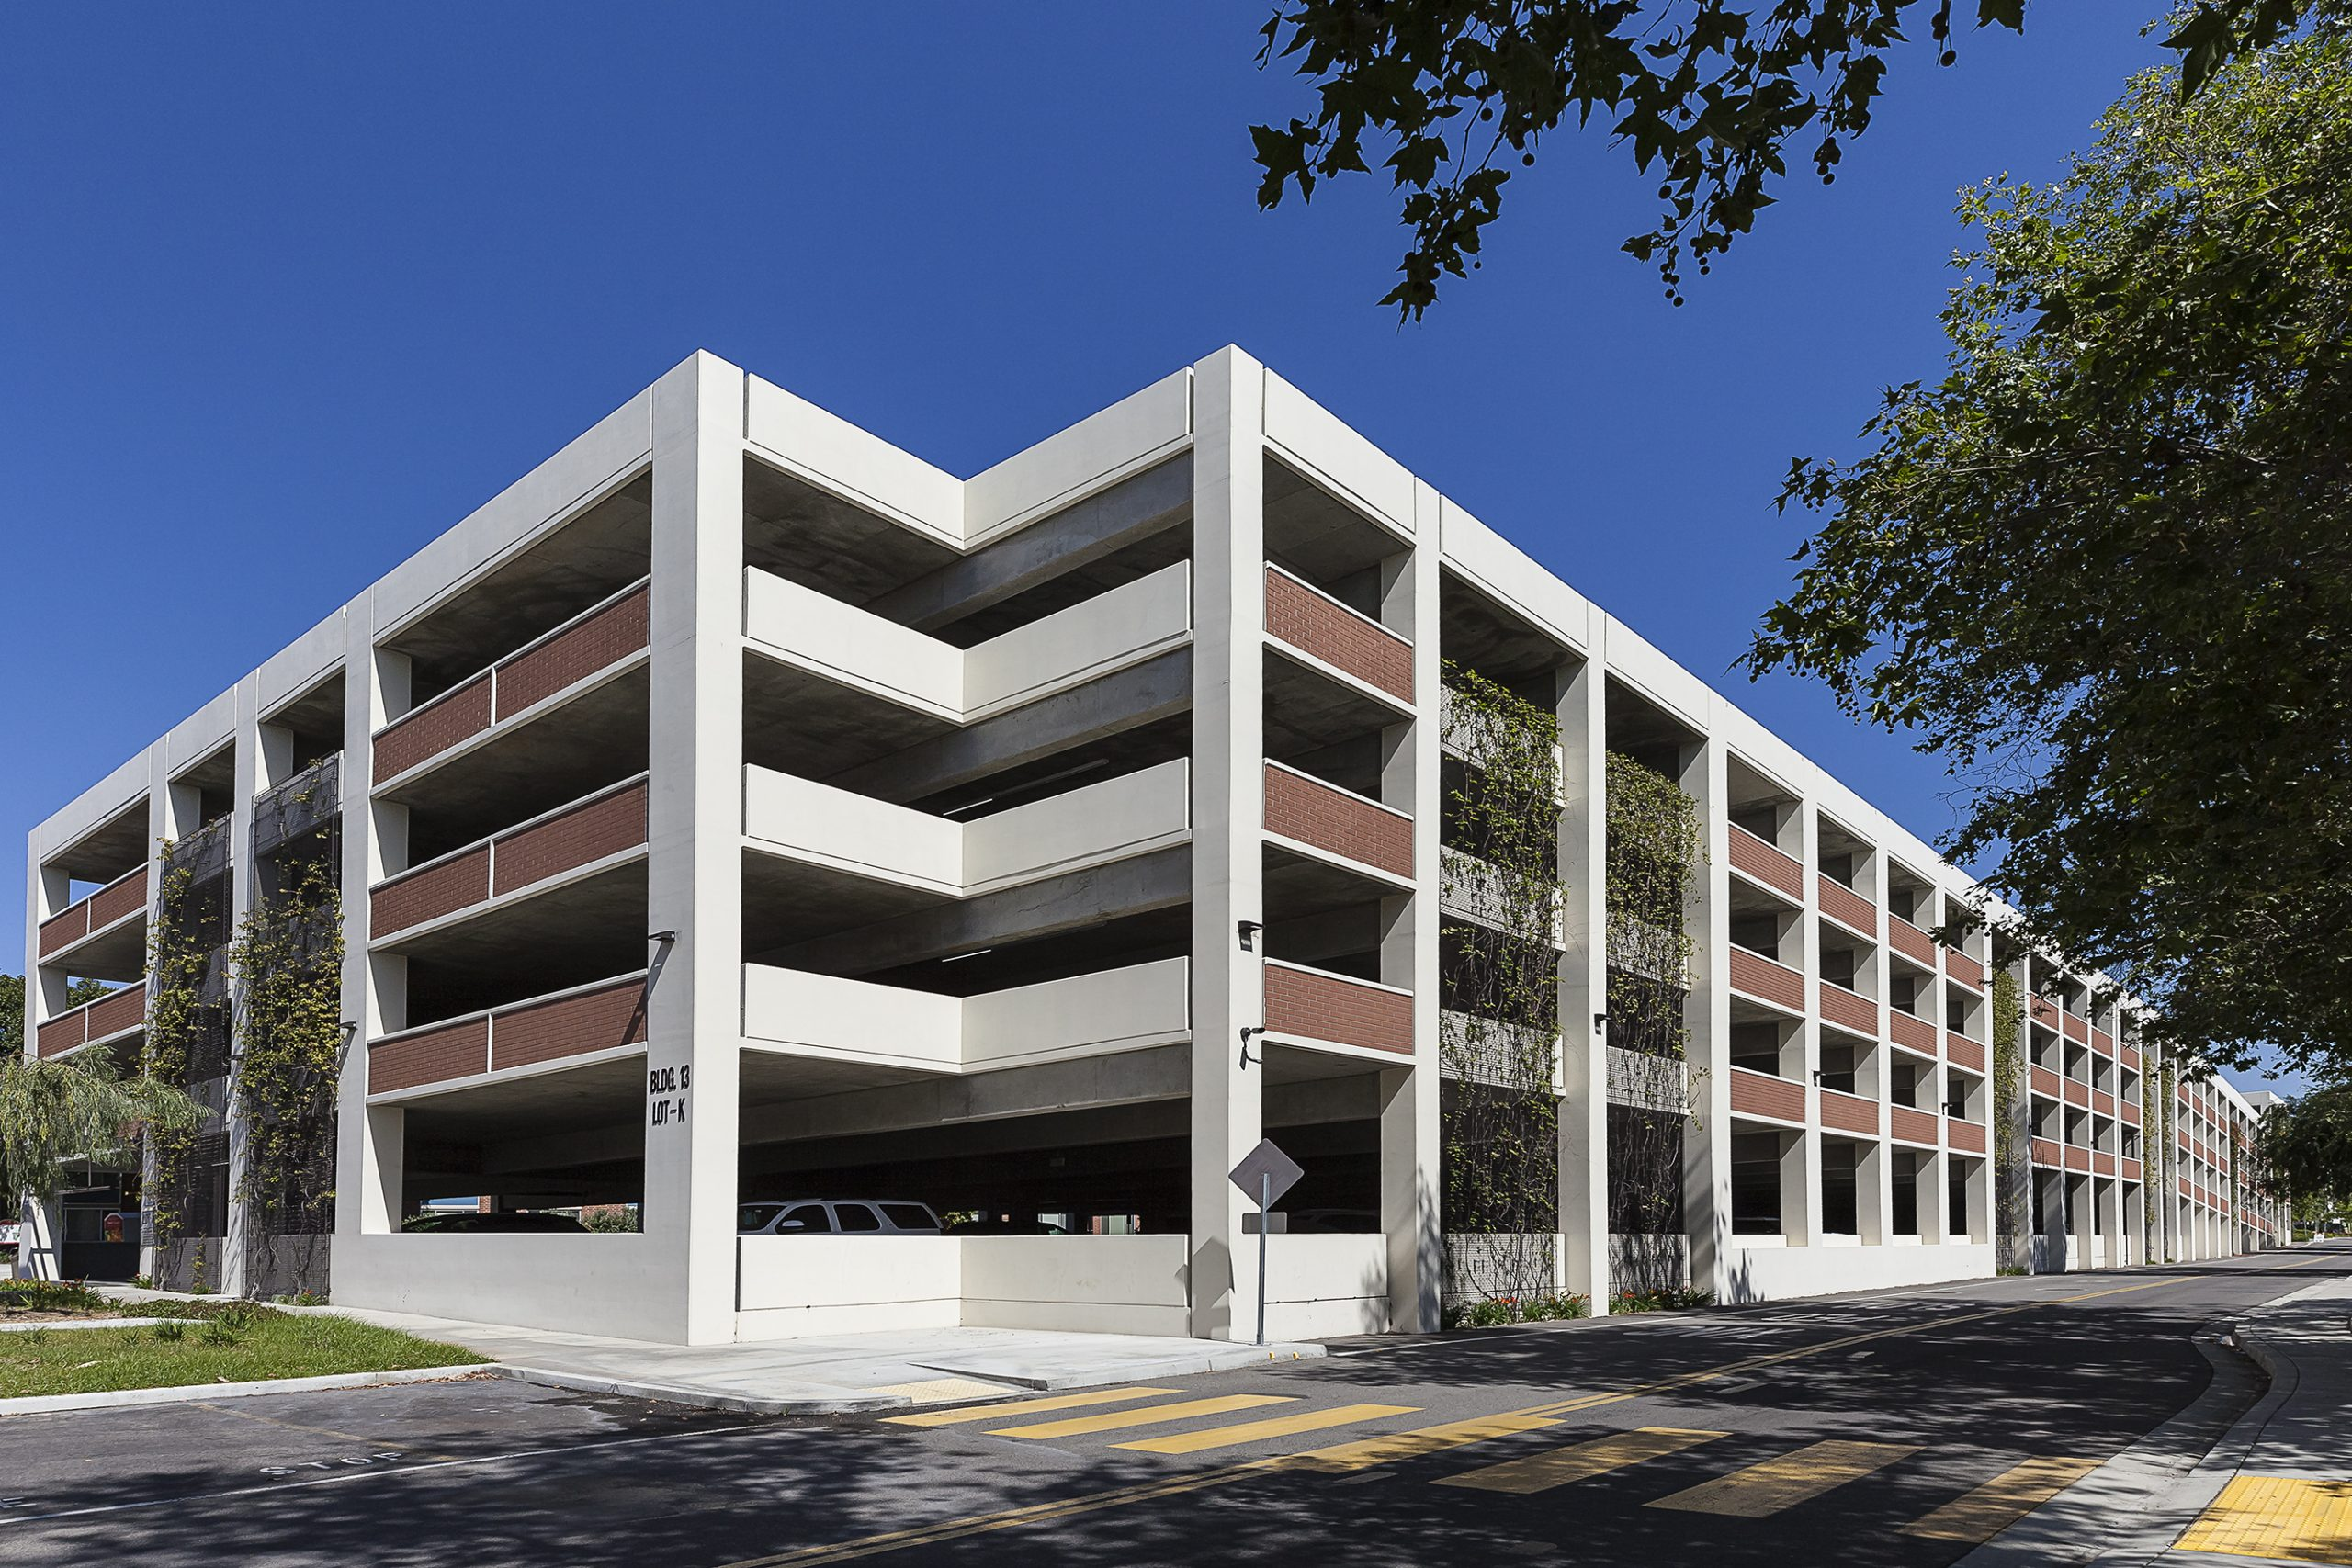 Biola University Lot K Parking Structure